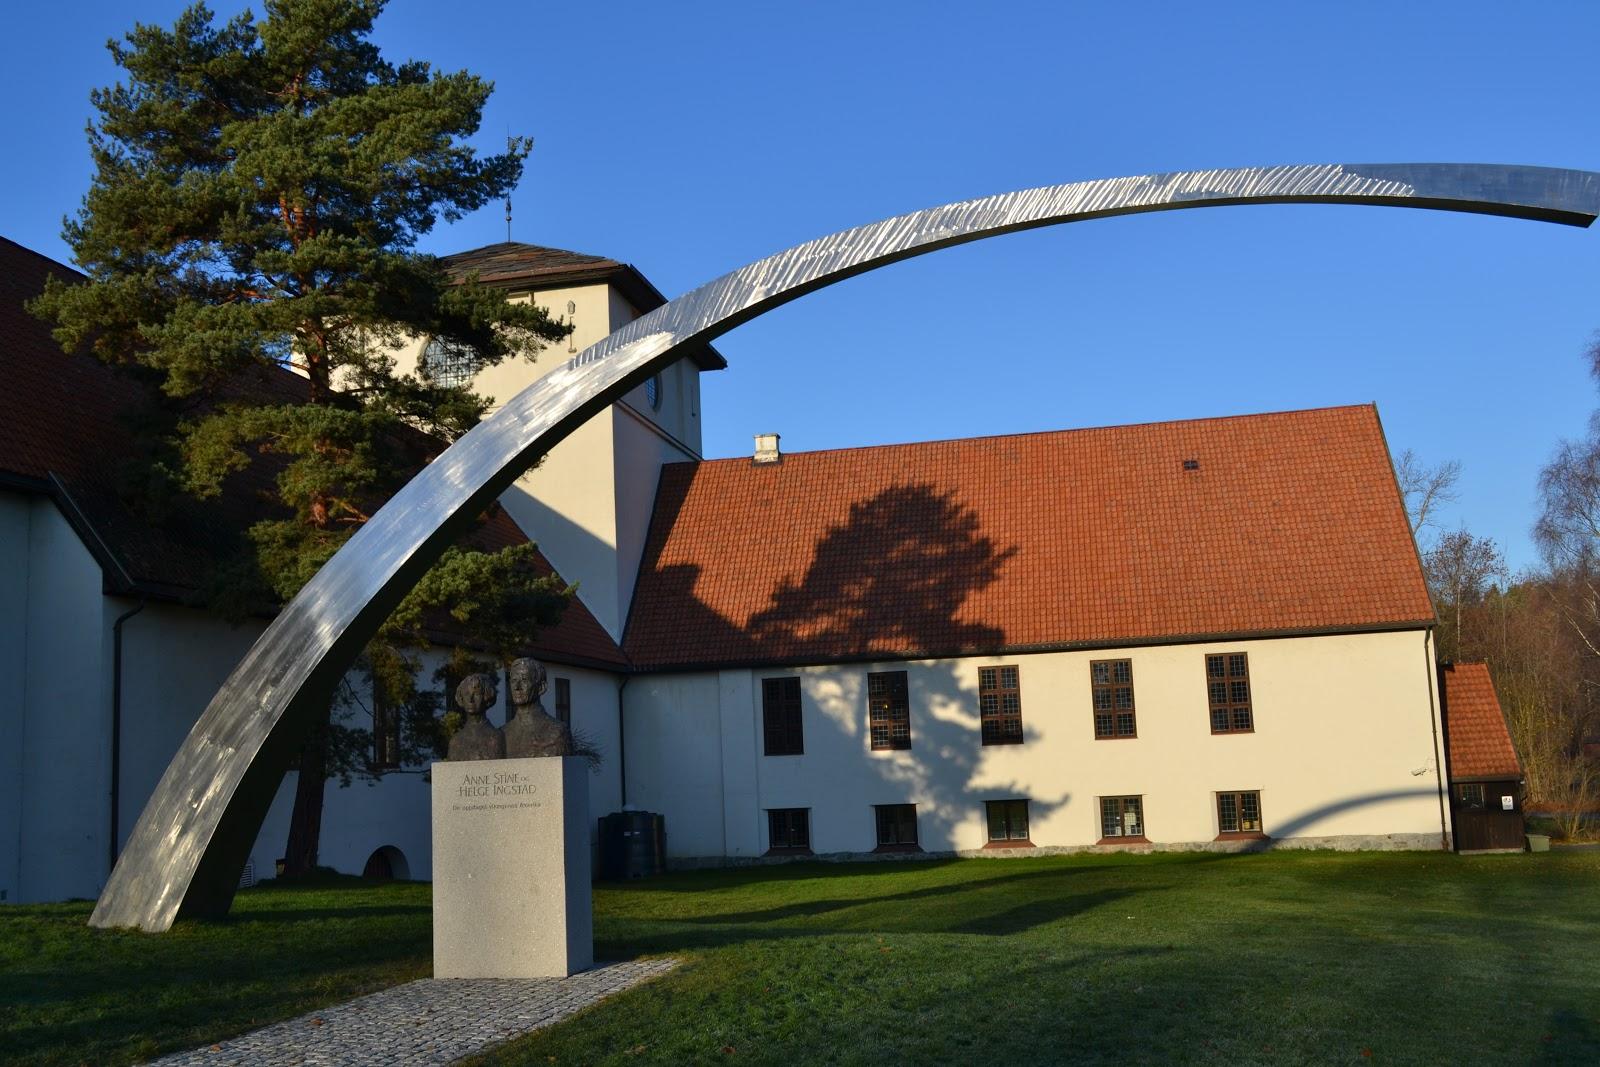 Viking Ship museum, Bygdøy